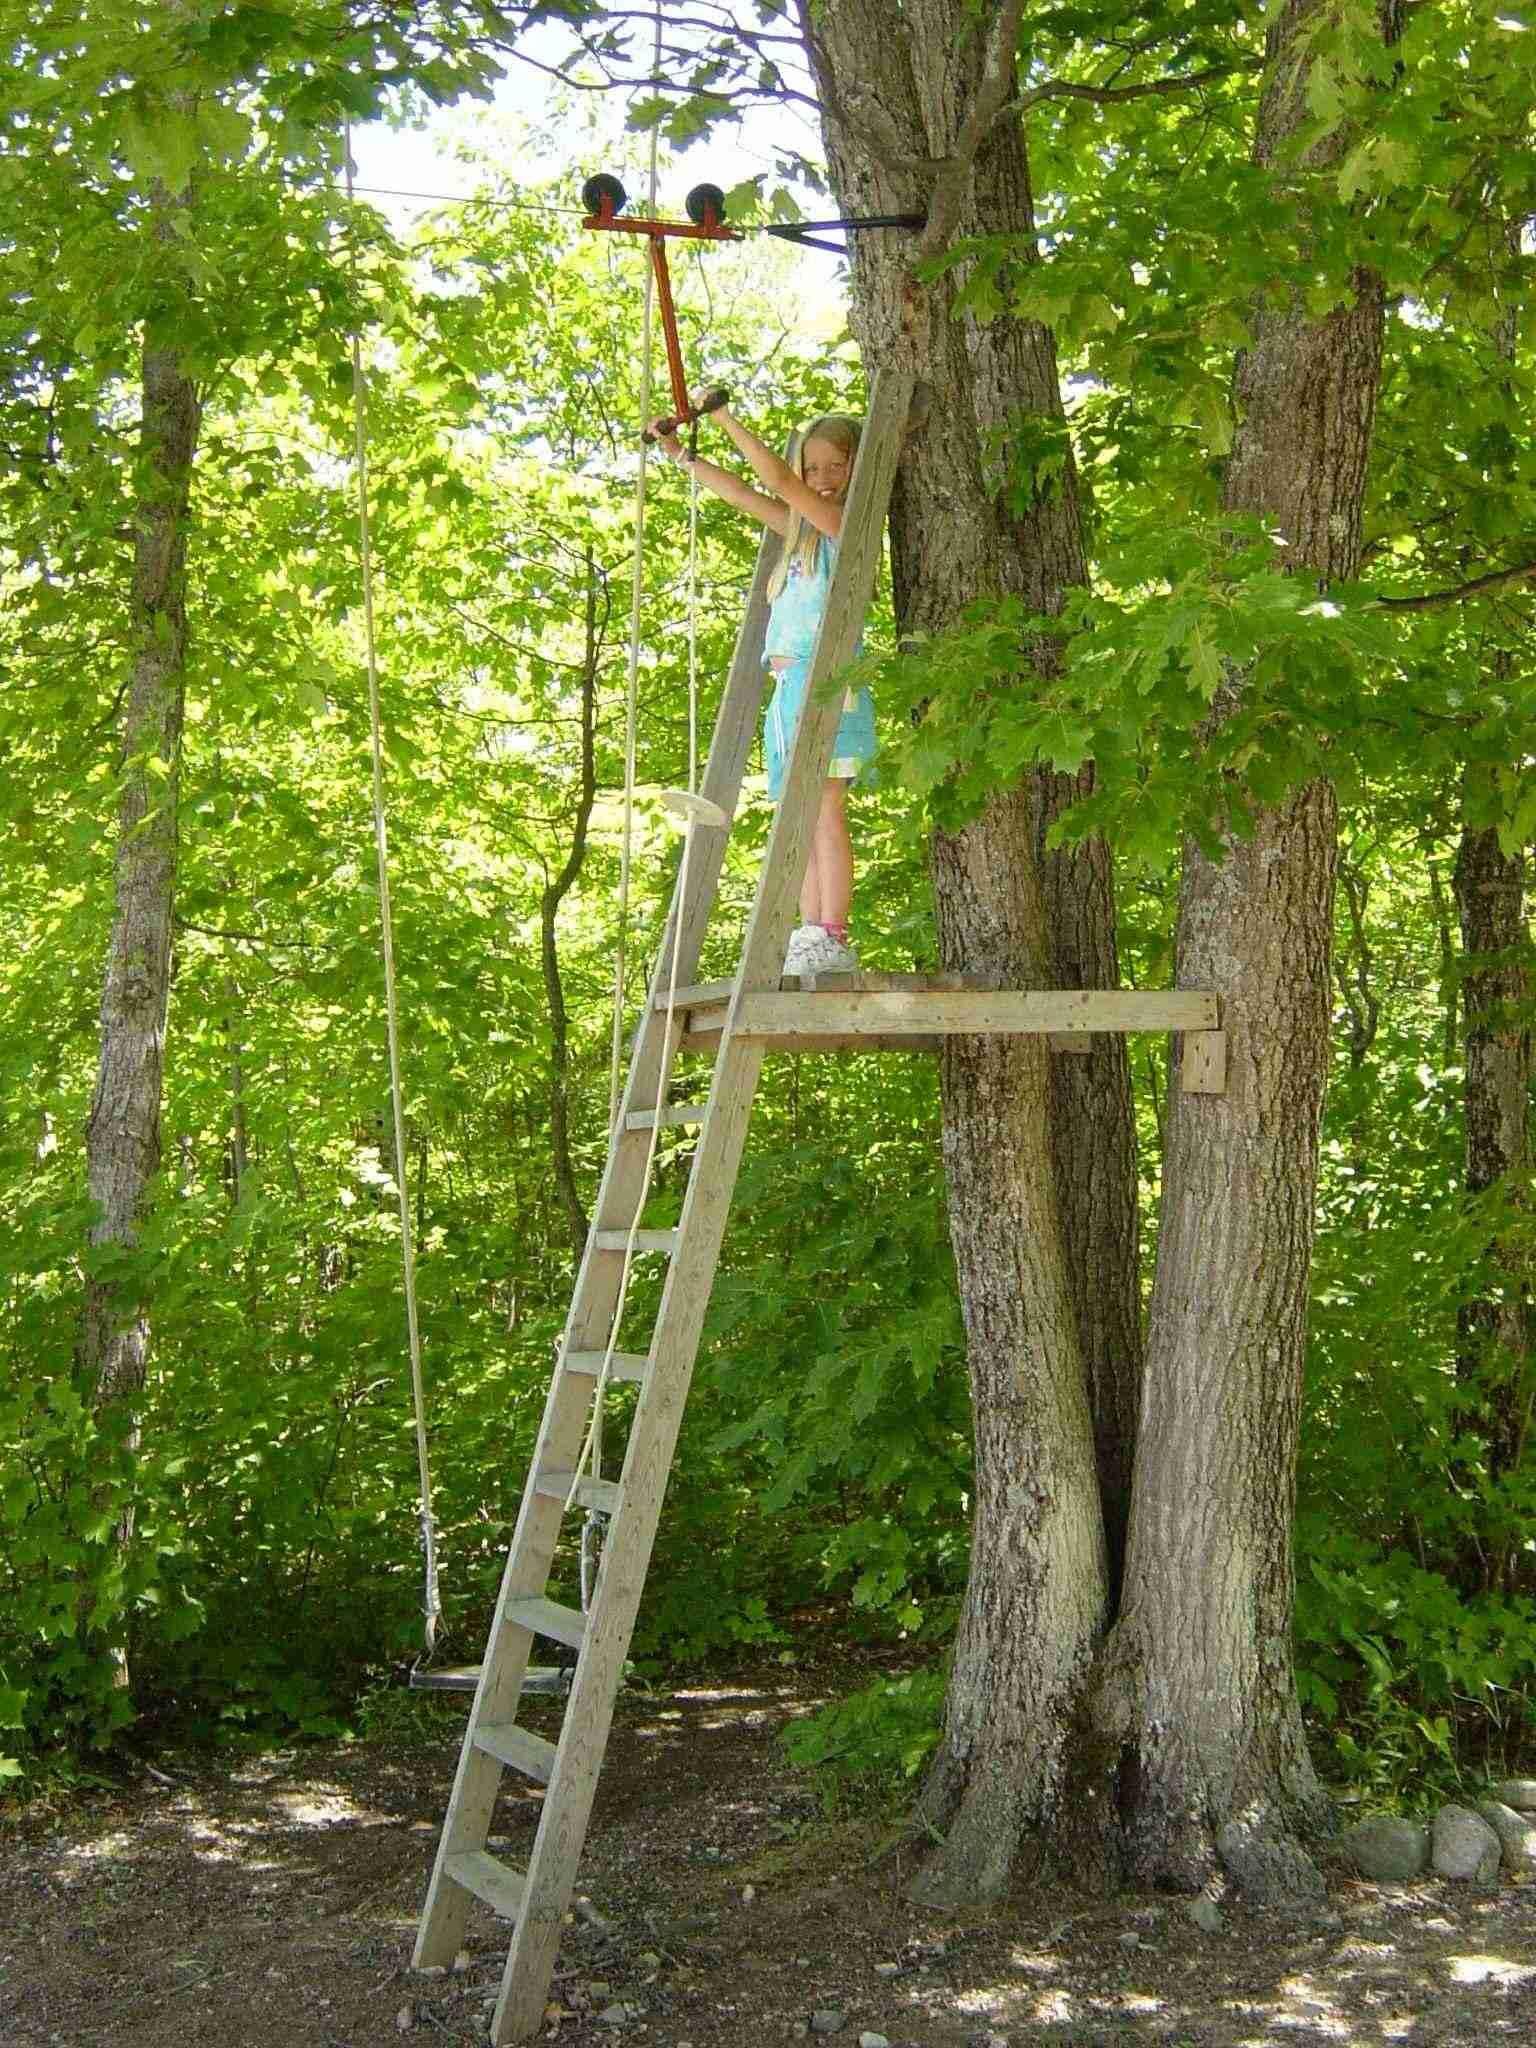 Zipline Tree Fort Note Great Structure And Support Ideas Ladder Could Be A Climbing Wall Im Freien Hintergarten Garten Landschaftsbau Diy backyard zip line